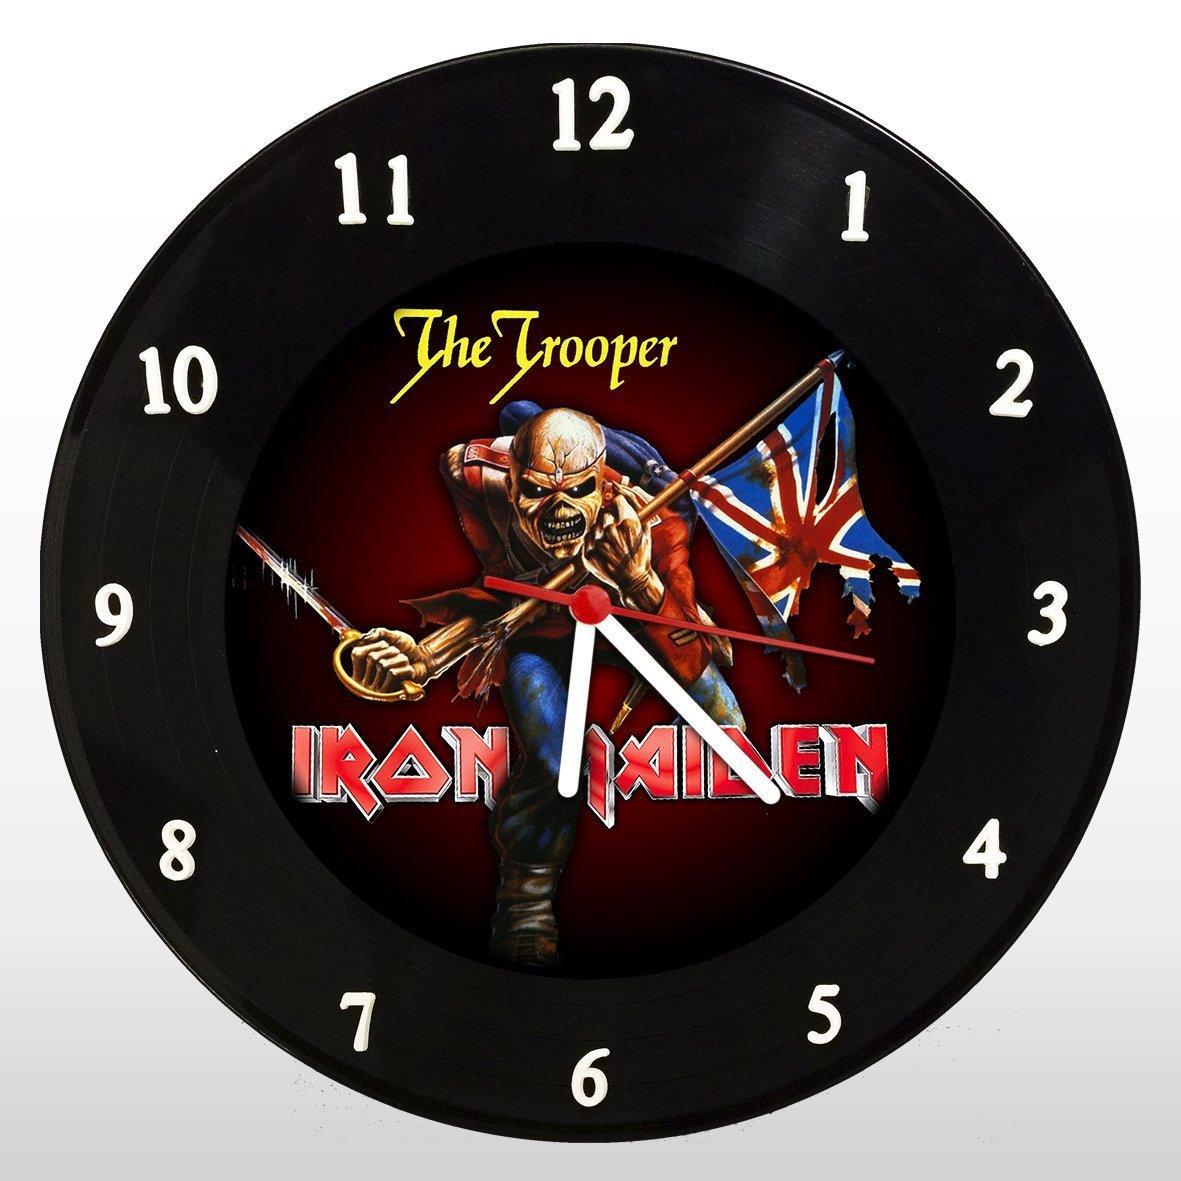 Iron Maiden - The Trooper - Relógio de Parede em Disco de Vinil - Mr. Rock